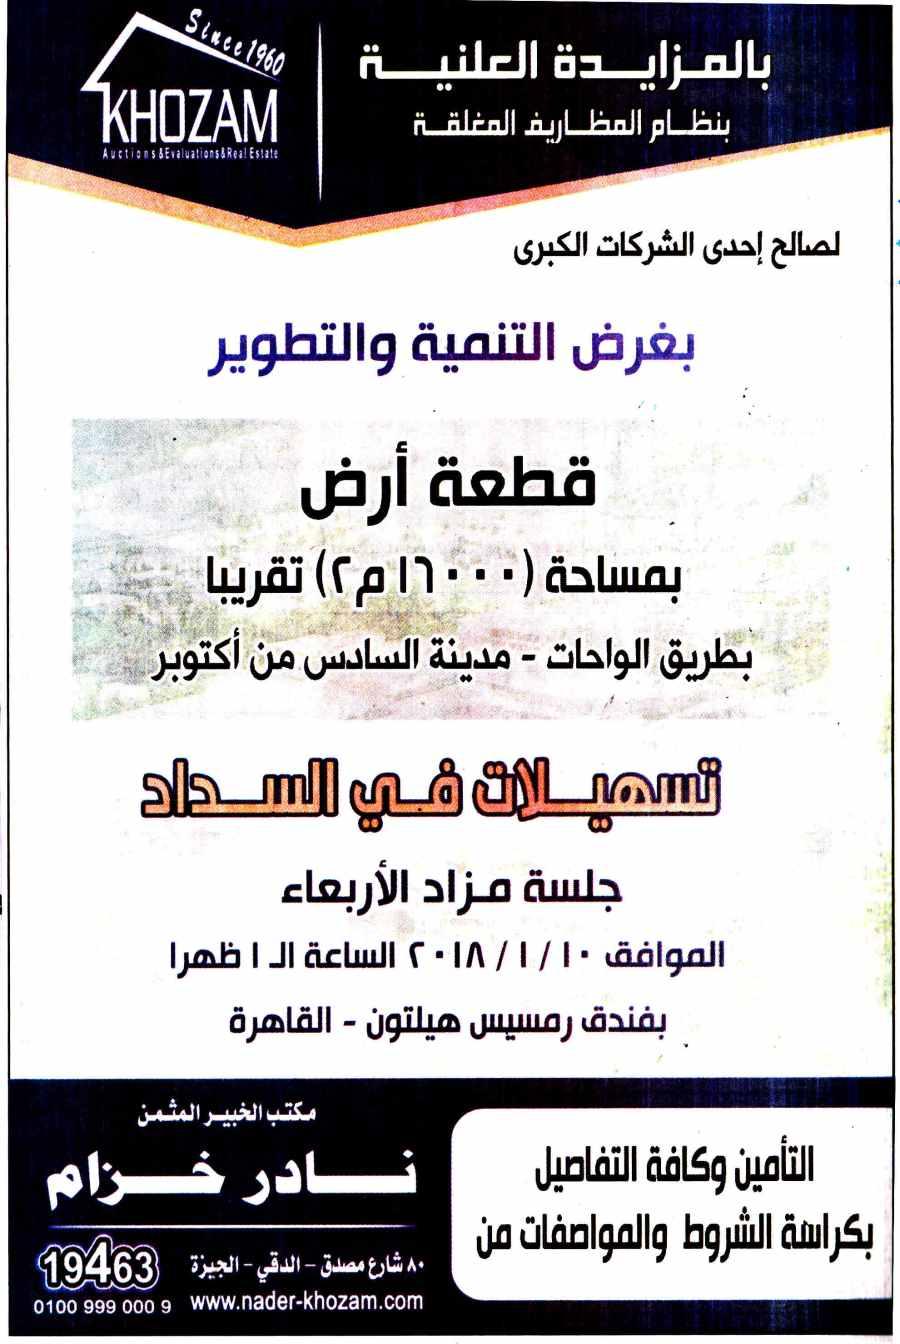 Al Ahram 29 Dec P.8.jpg